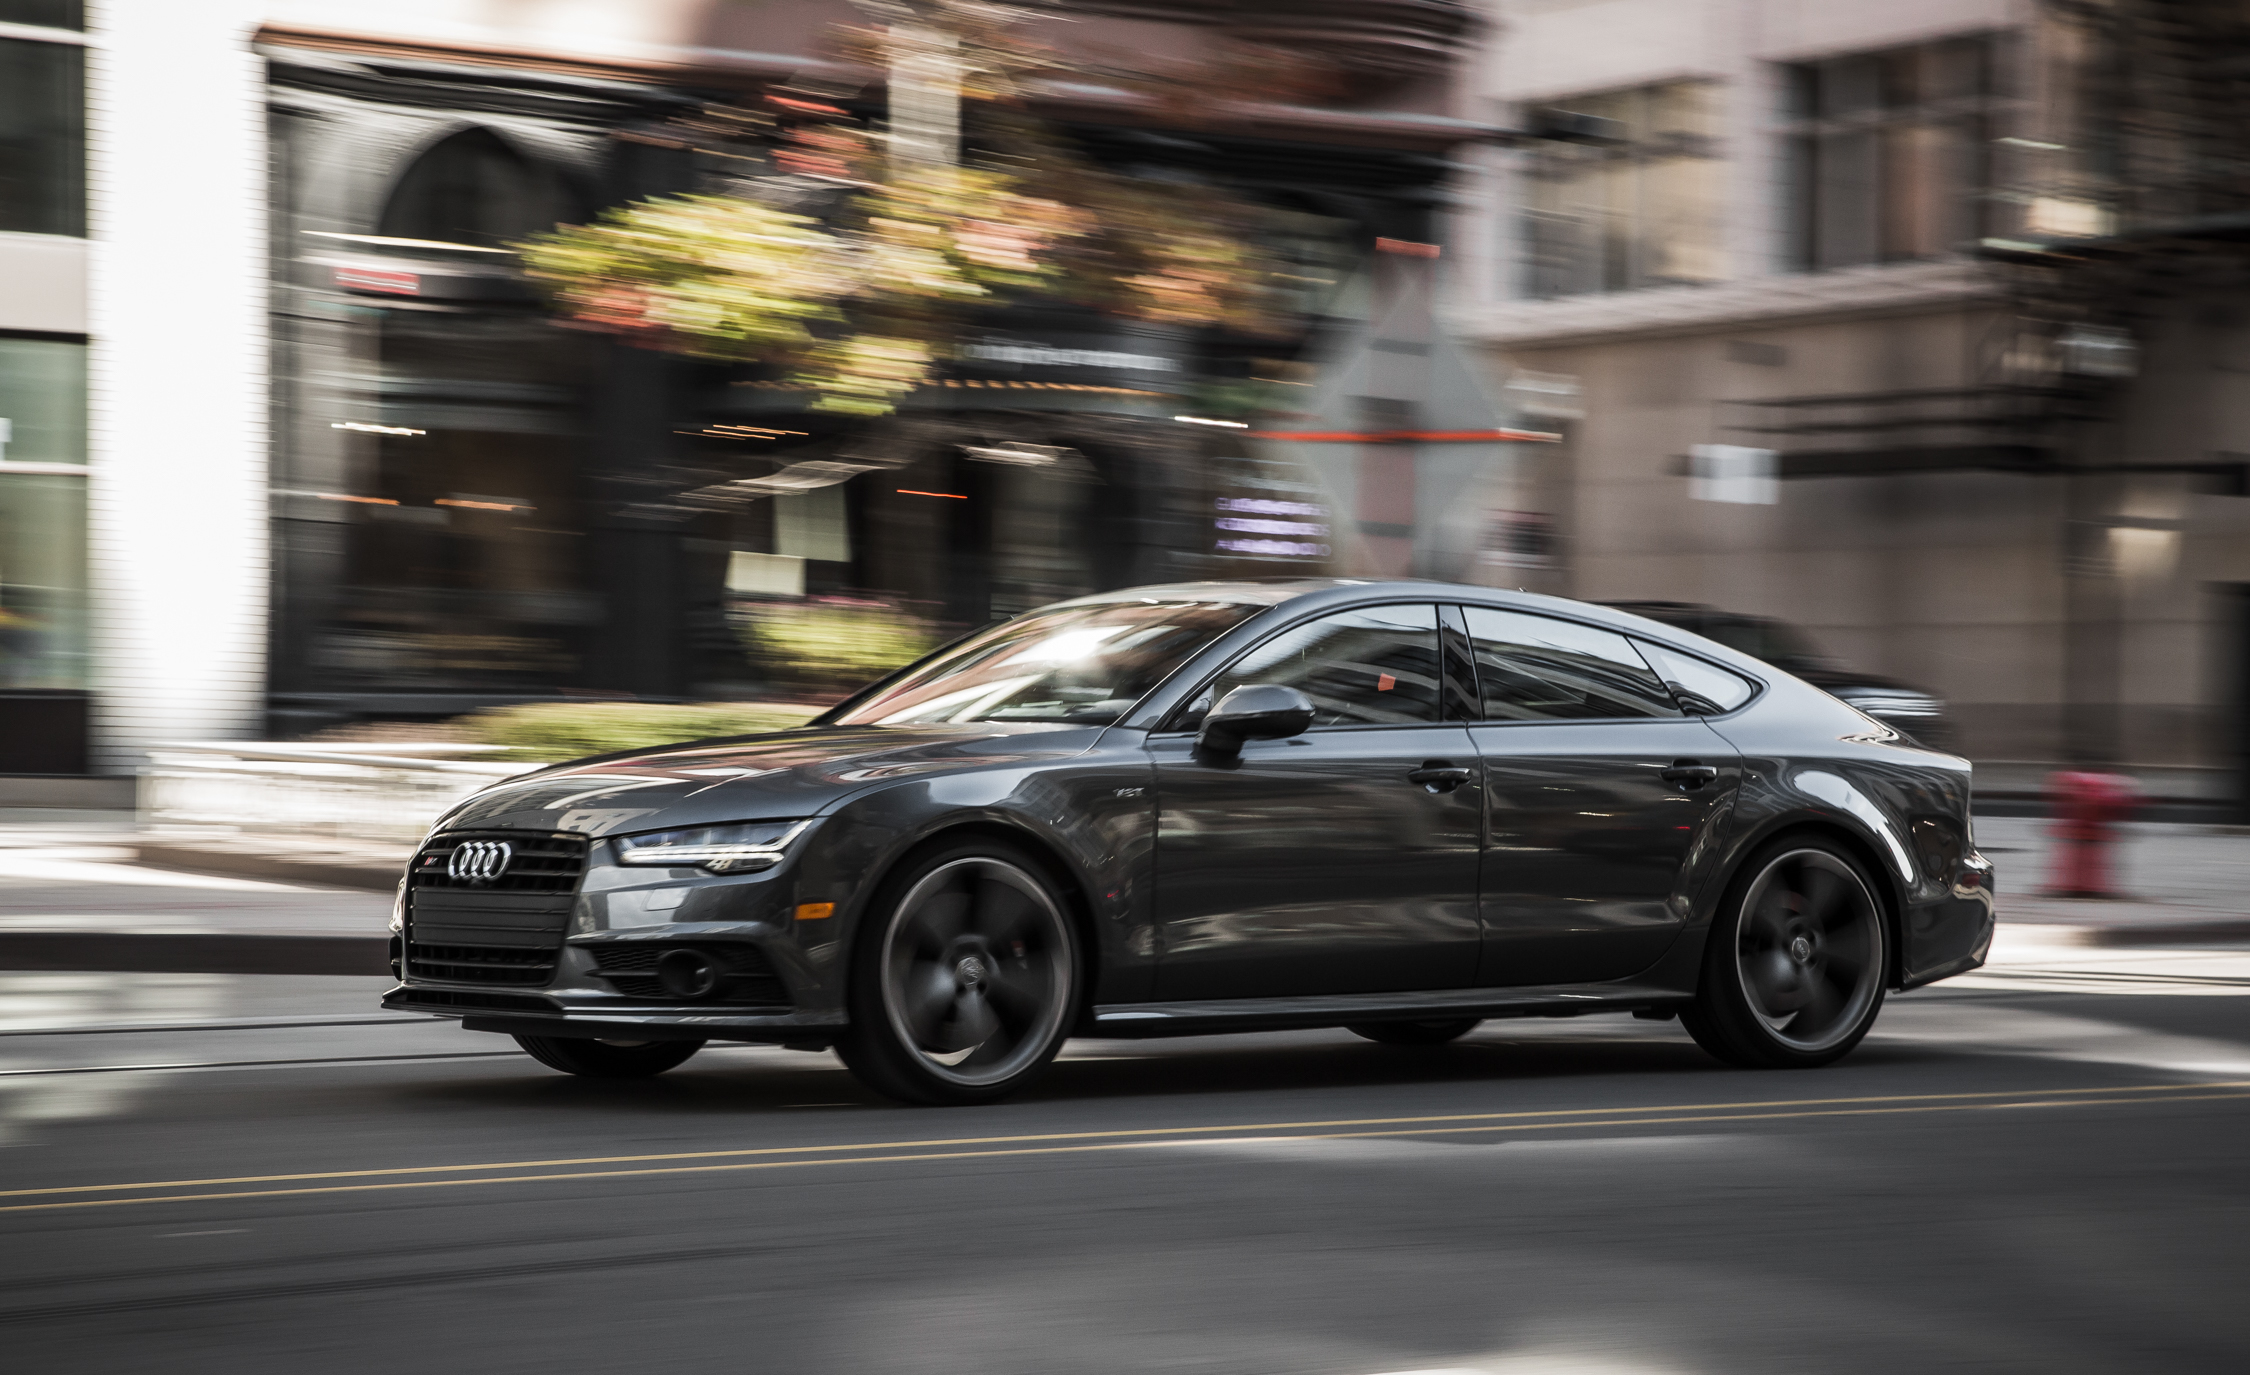 2016 Audi S7 Sedan Test